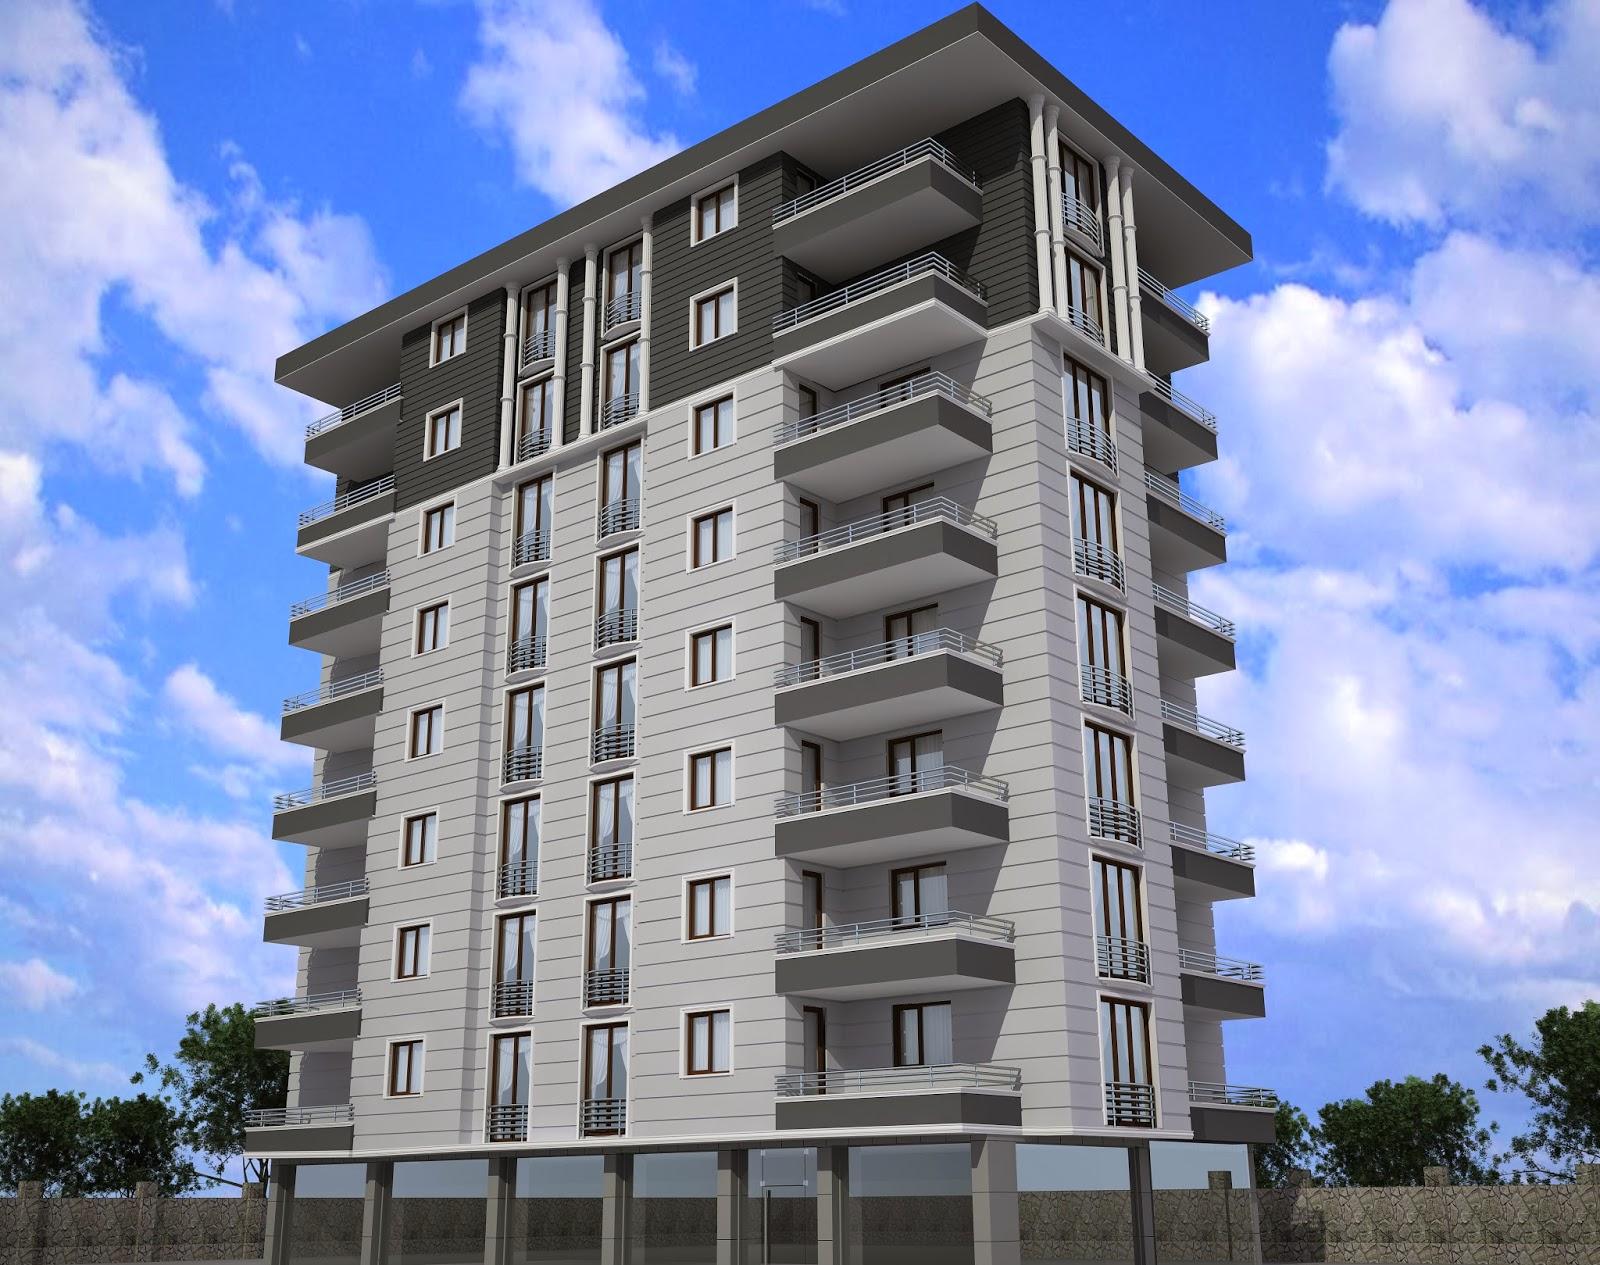 Selling house (3 rooms) in baku - 50,000m real-estate for sale 2elaz milli elanlar sayt